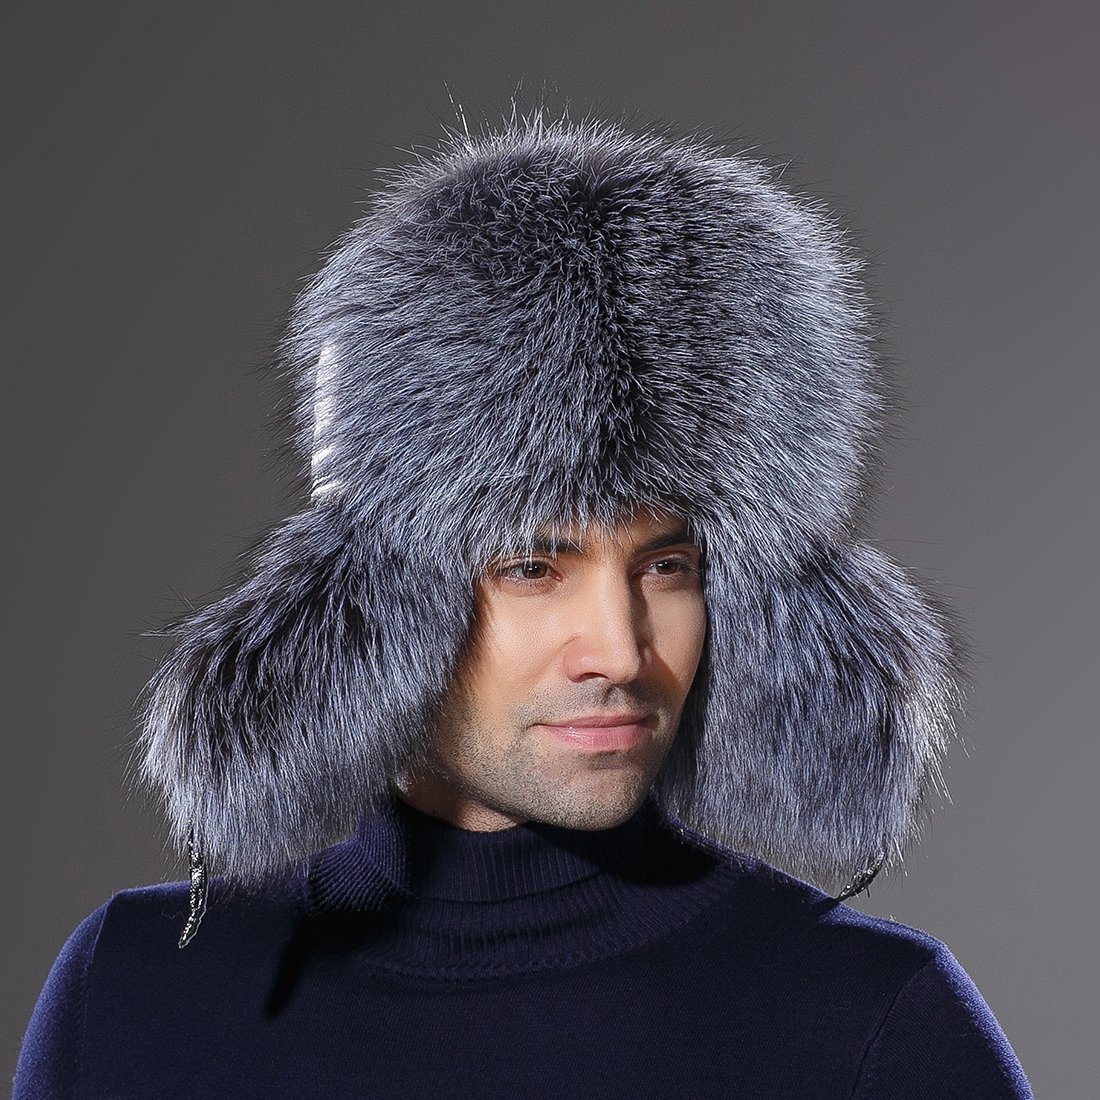 URSFUR Winter Mens Trapper Hat Real Leather Silver Fox Fur Russian Ushanka Cap by URSFUR (Image #7)